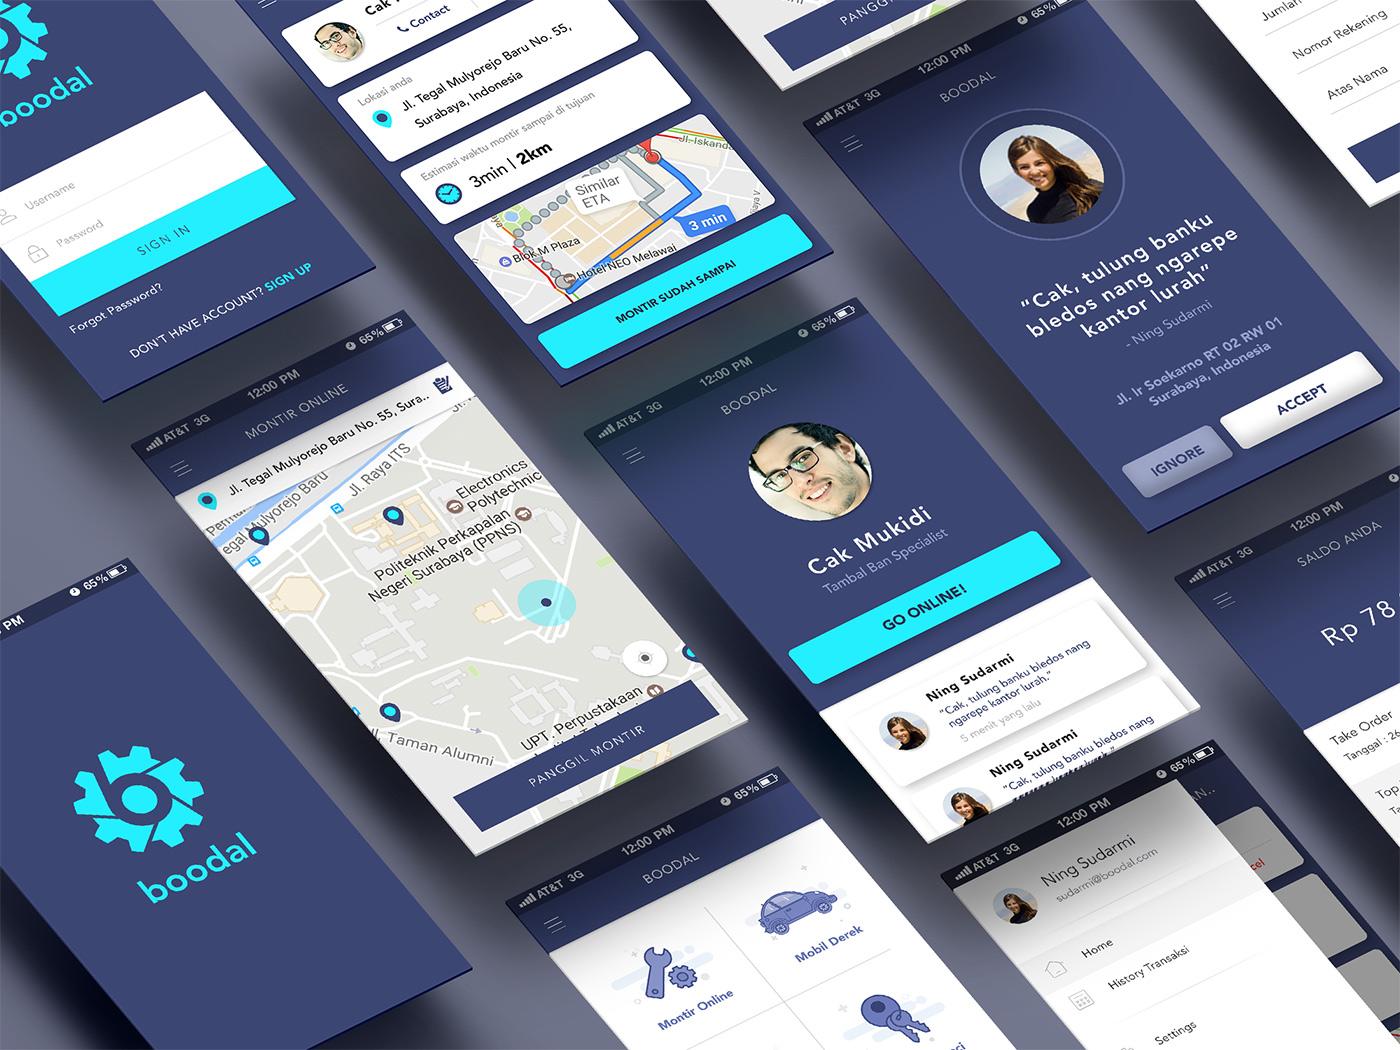 Bloodal App Design UI Kit for PSD Designer - vehicle assisstant